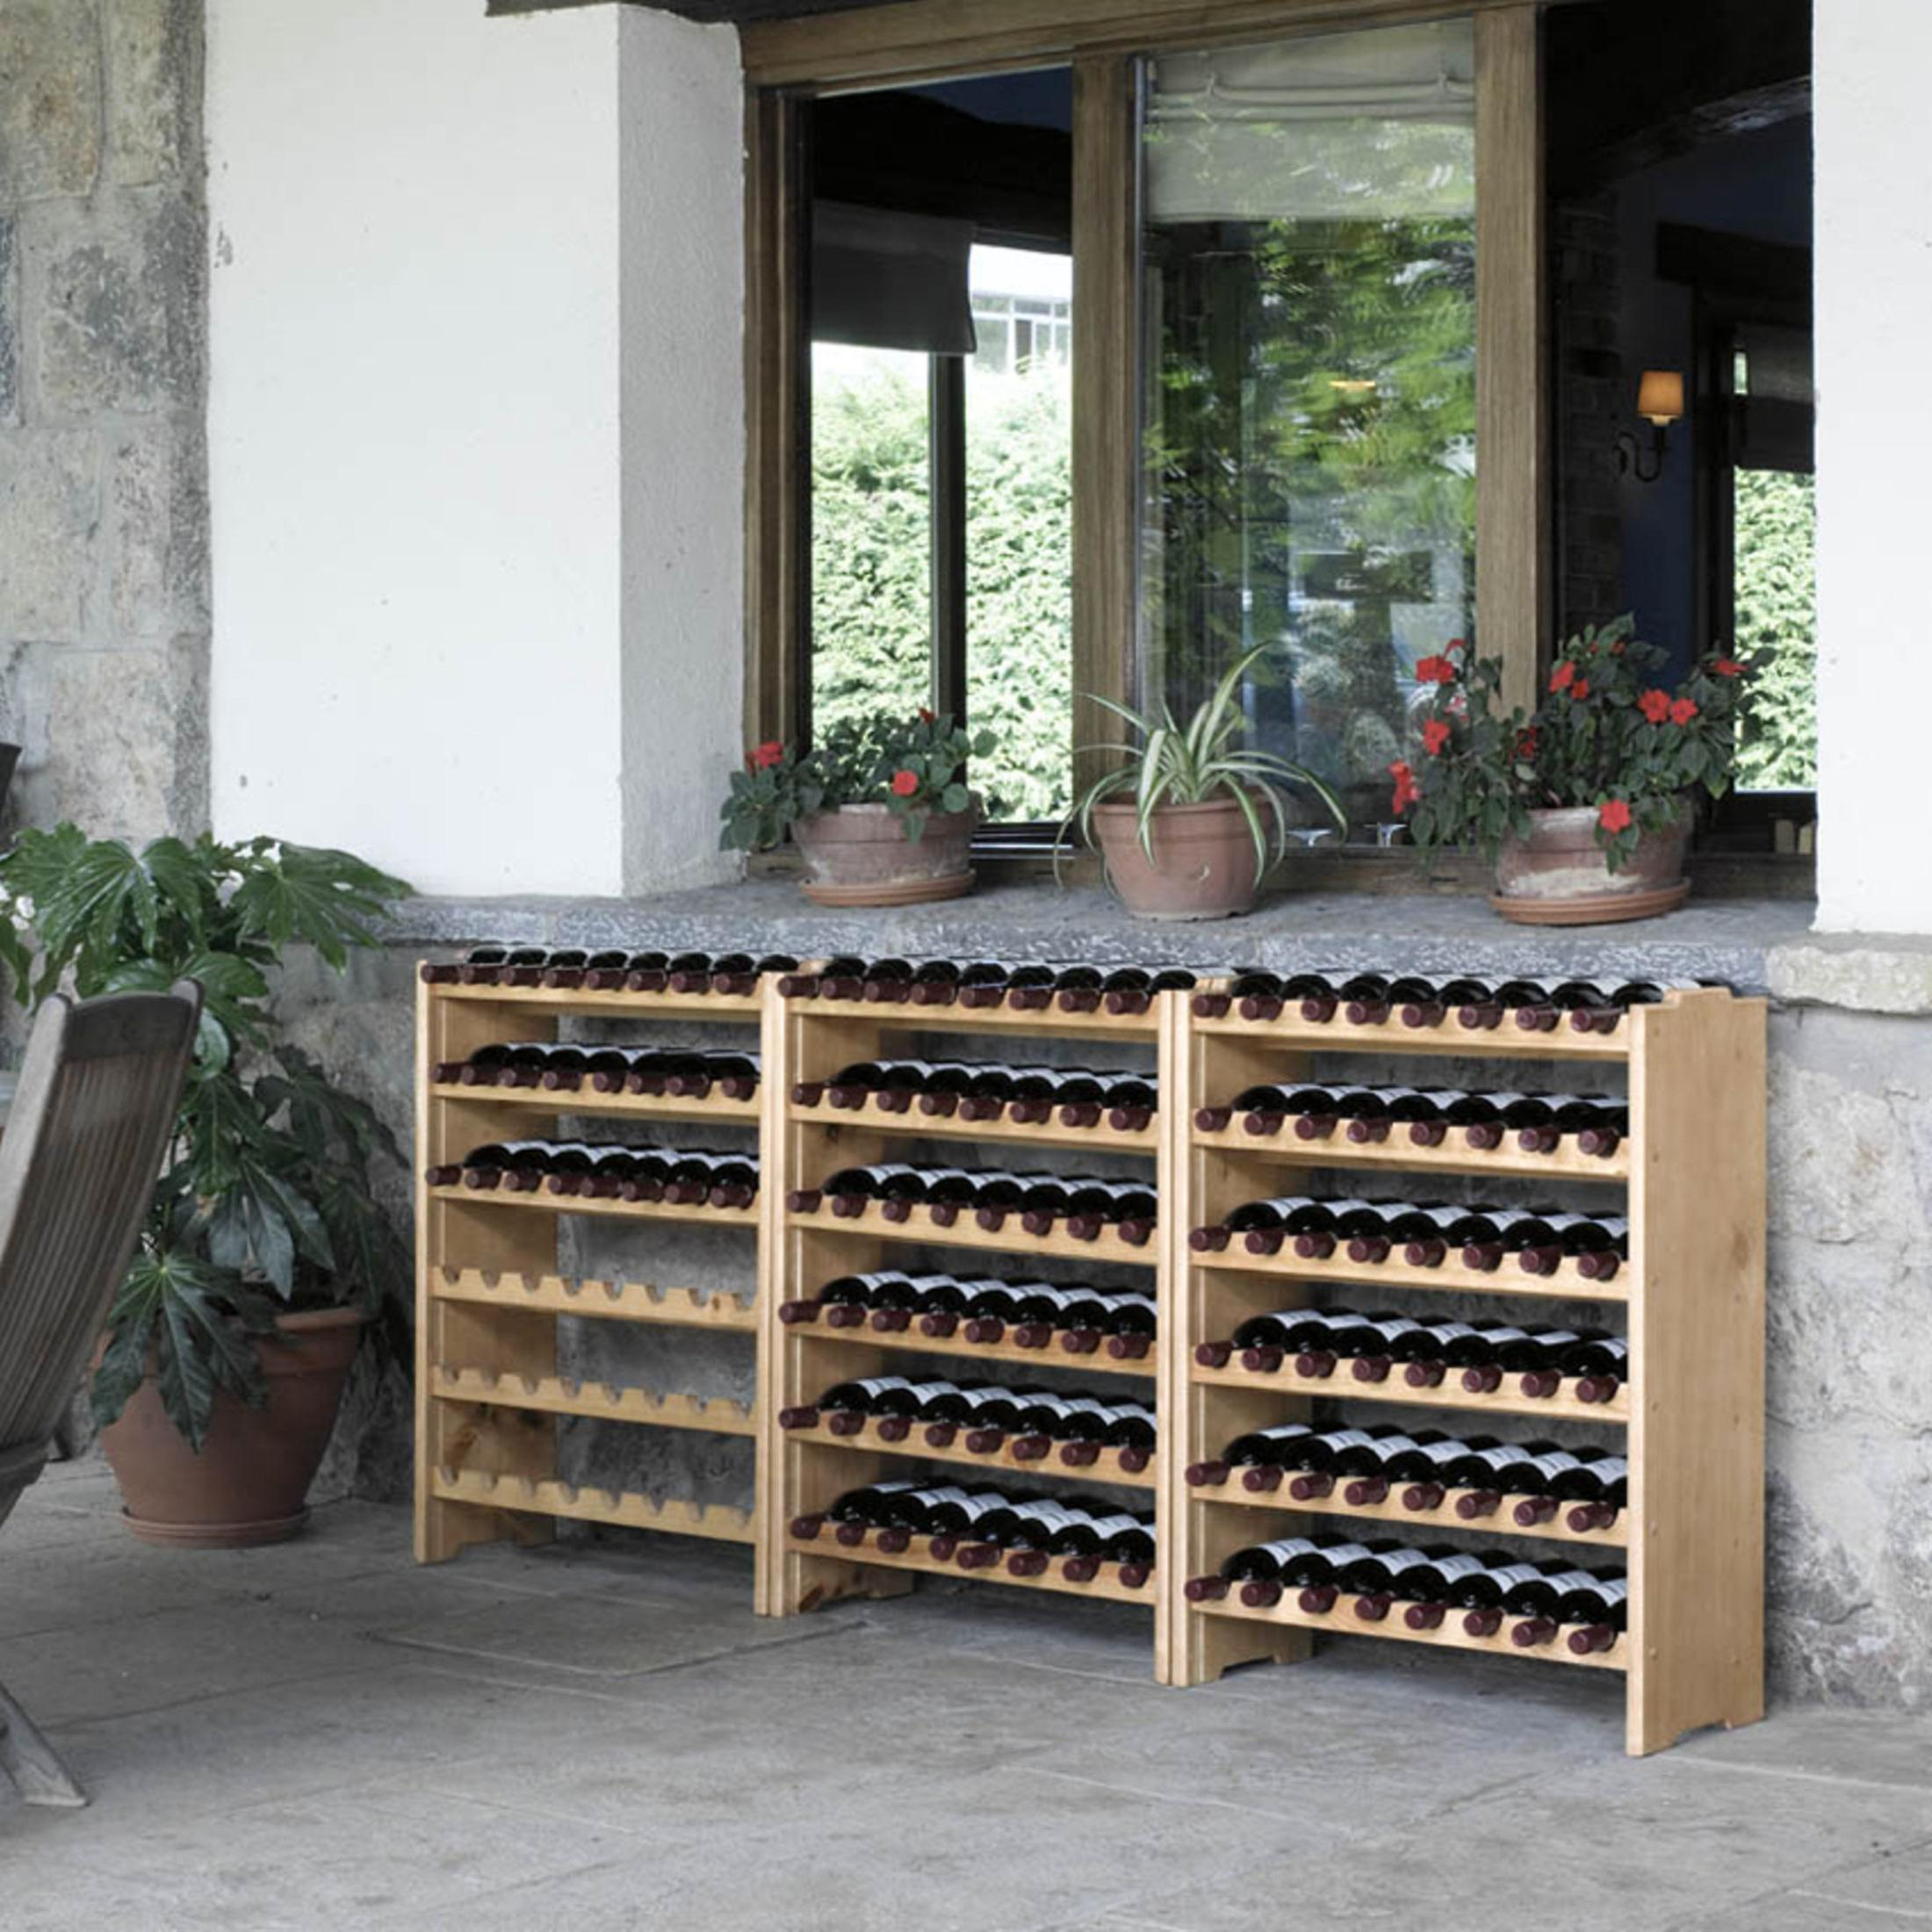 weinregal system medoc holz kiefer natur stapelbar erweiterbar ebay. Black Bedroom Furniture Sets. Home Design Ideas